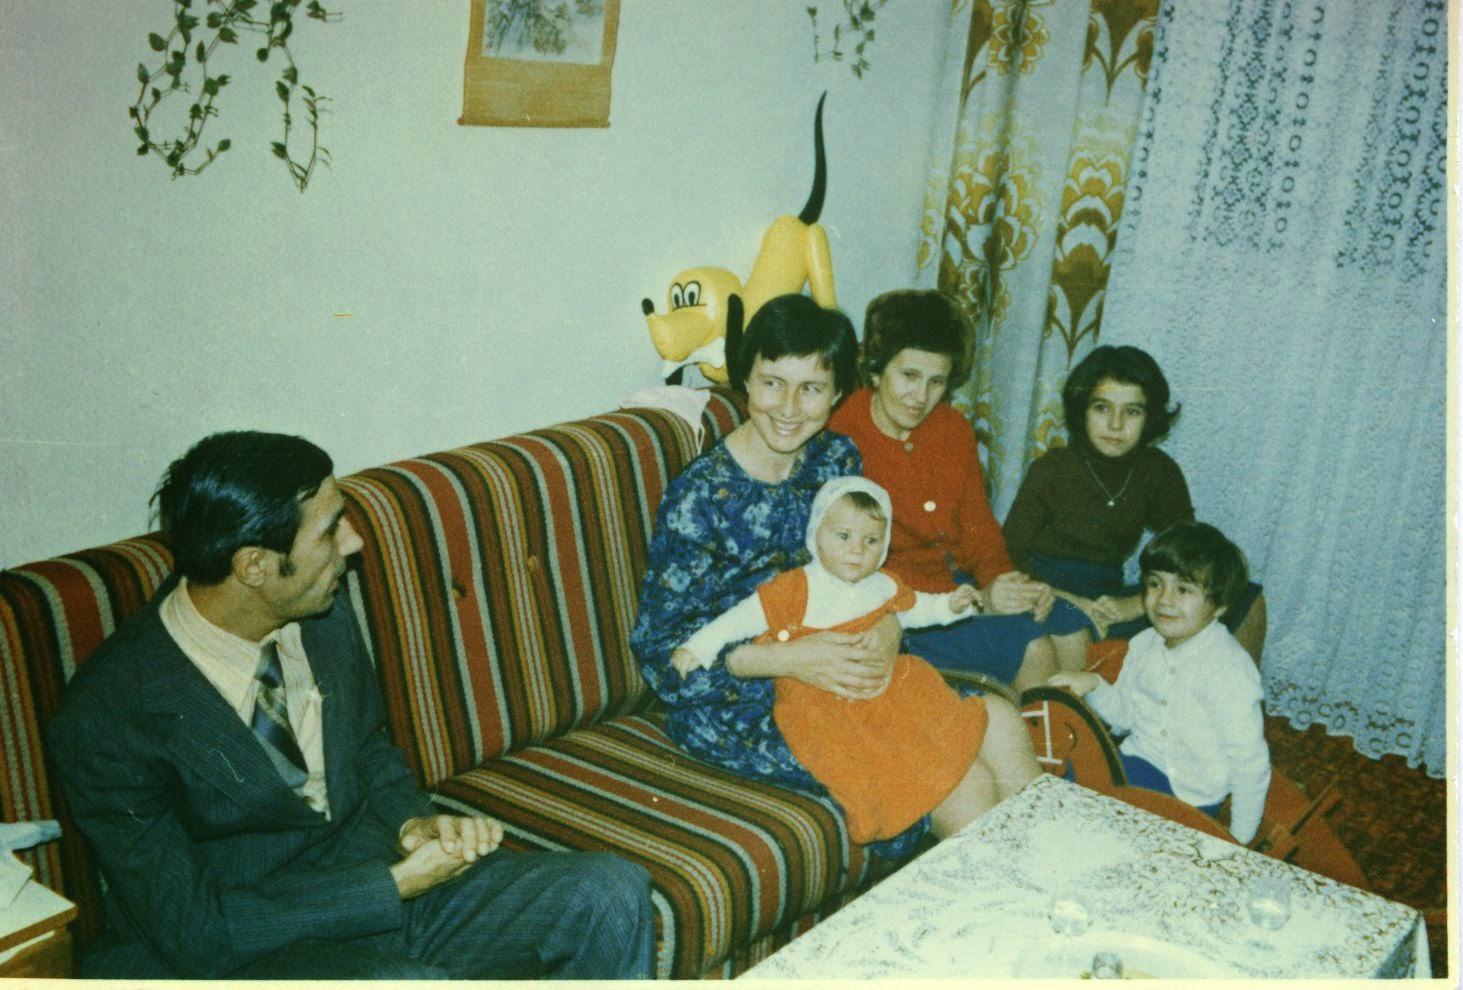 Olivia Maria, Nicolae, Magdalena, Silviu Marcov, Maria, Irina Craciunas in 1980 Bucharest sector 6